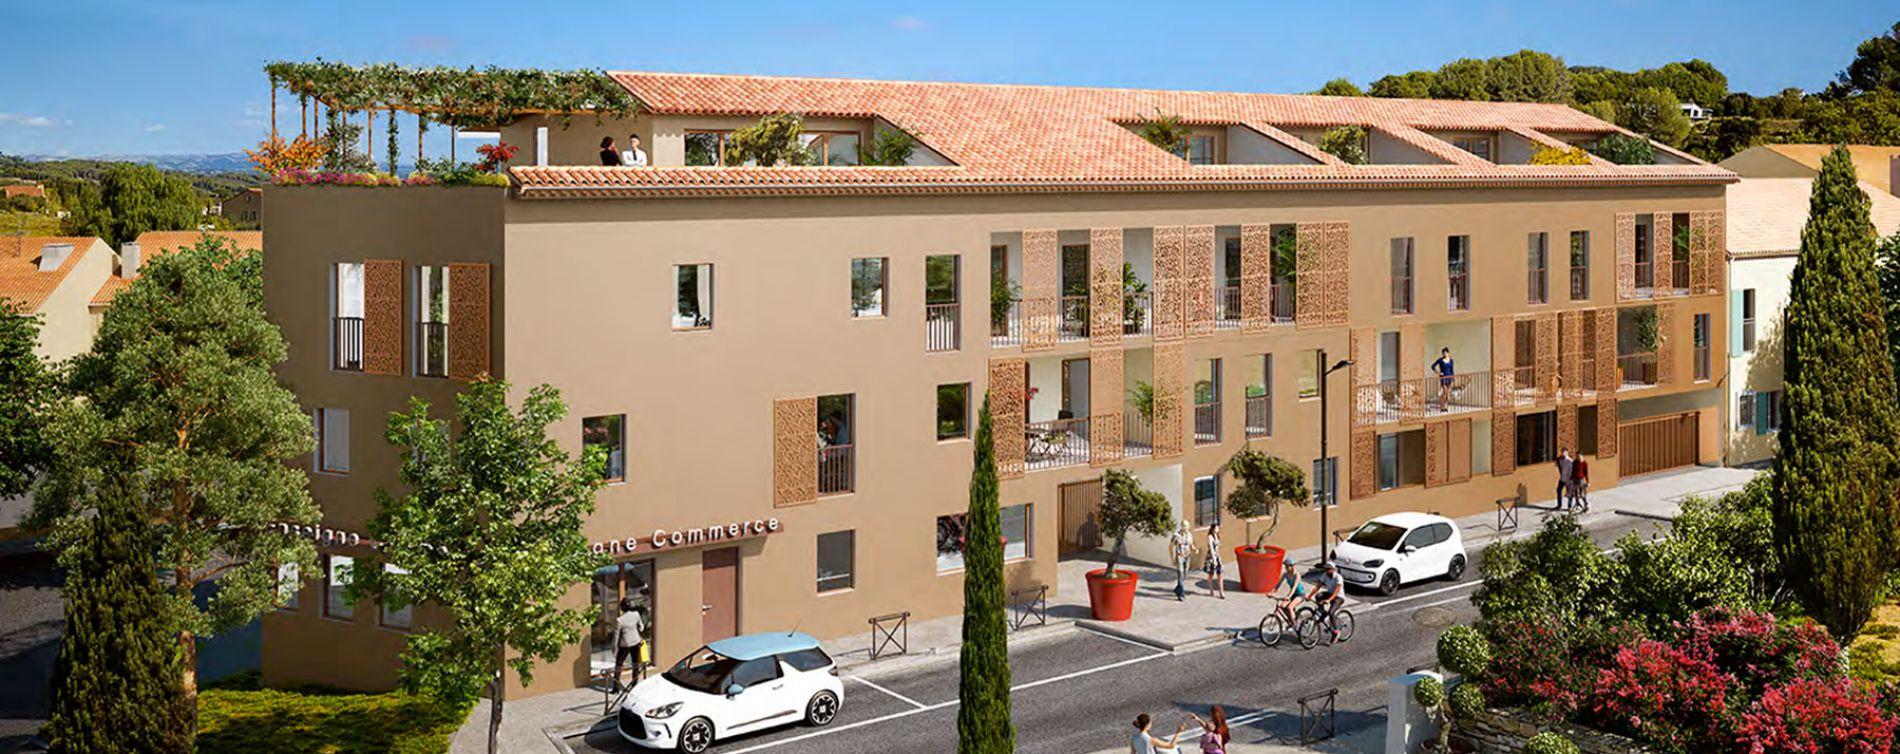 Résidence O Village au Castellet